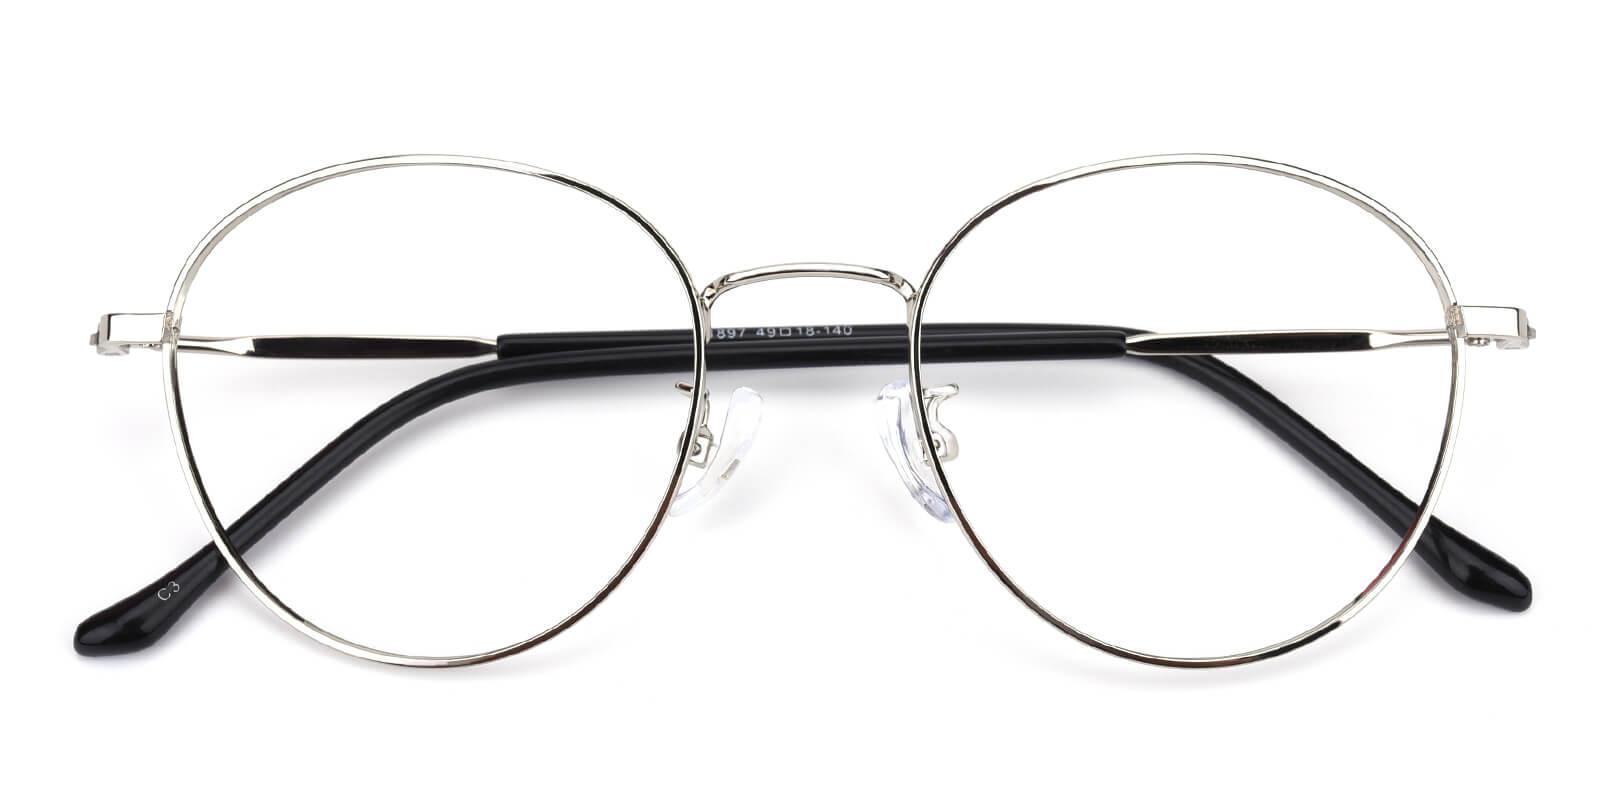 Devi-Silver-Oval-Metal-Eyeglasses-detail